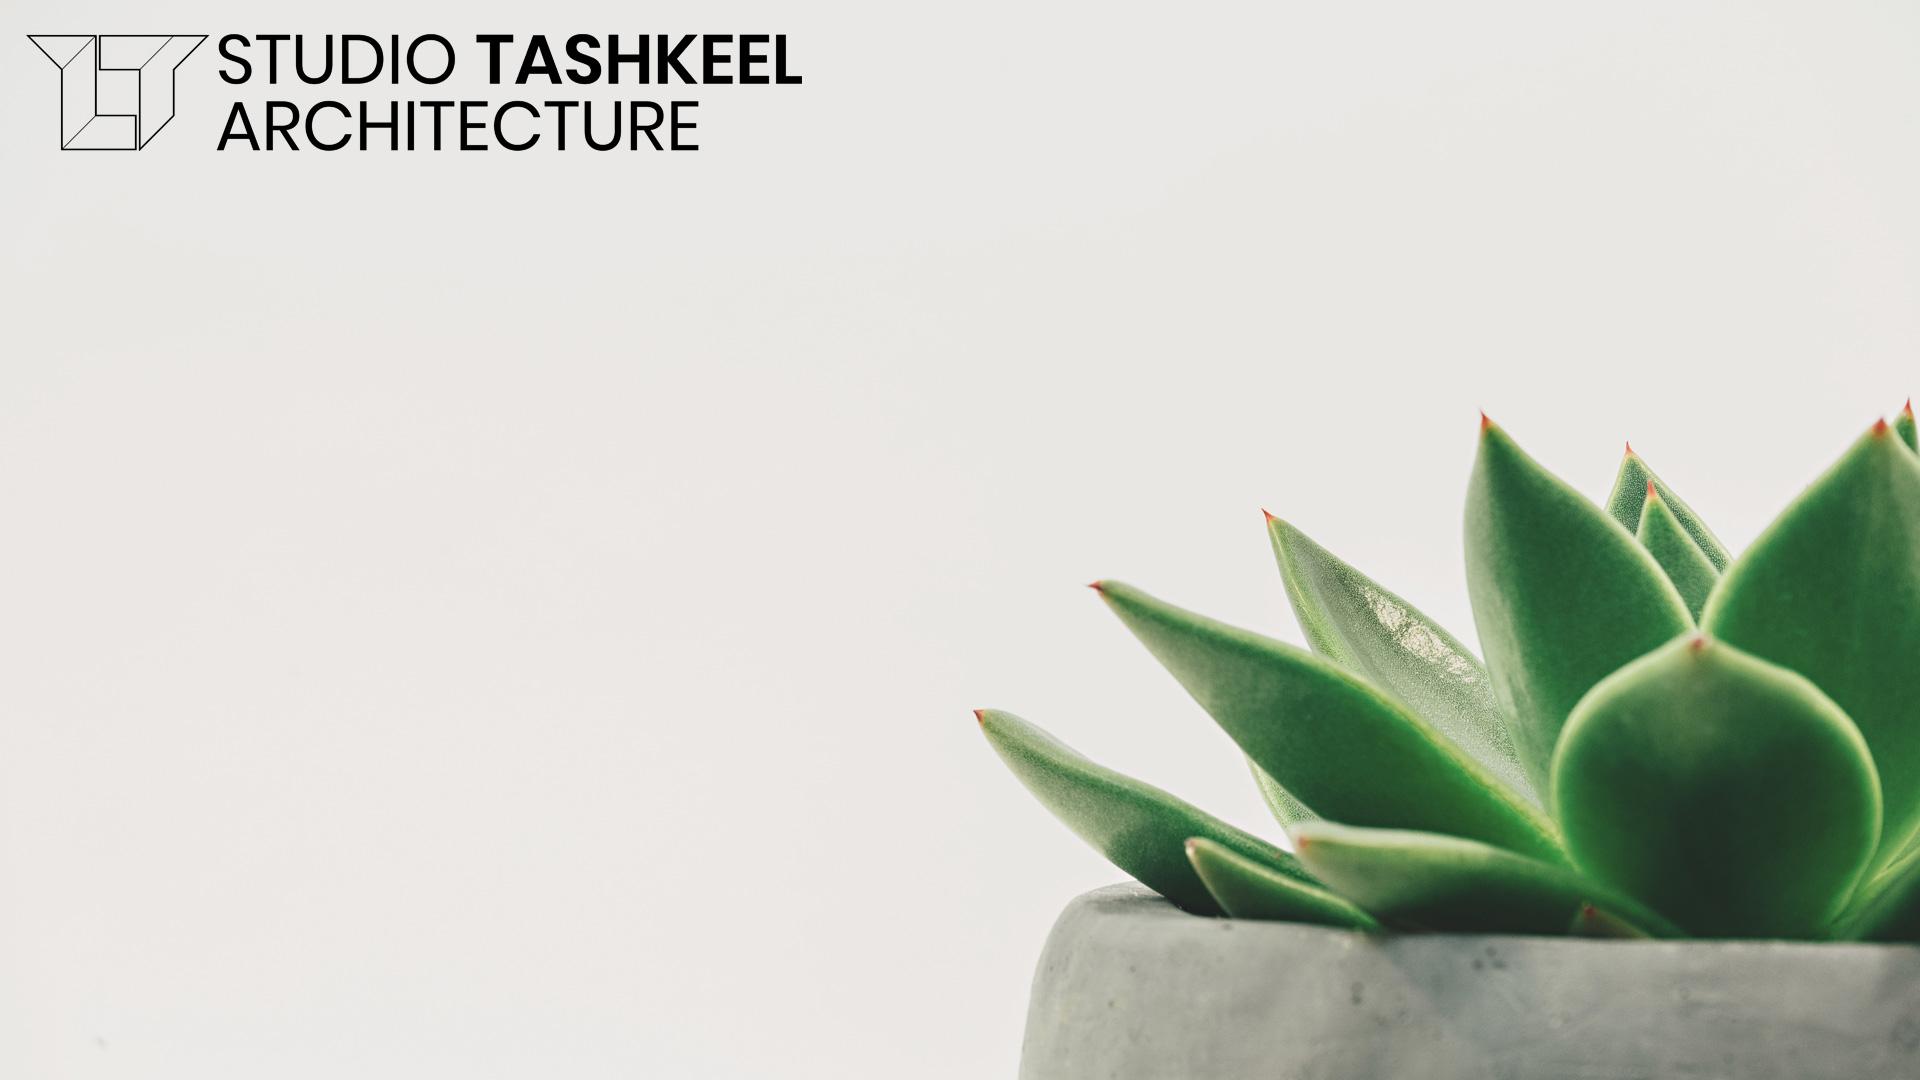 THE PRACTICE Studio Tashkeel